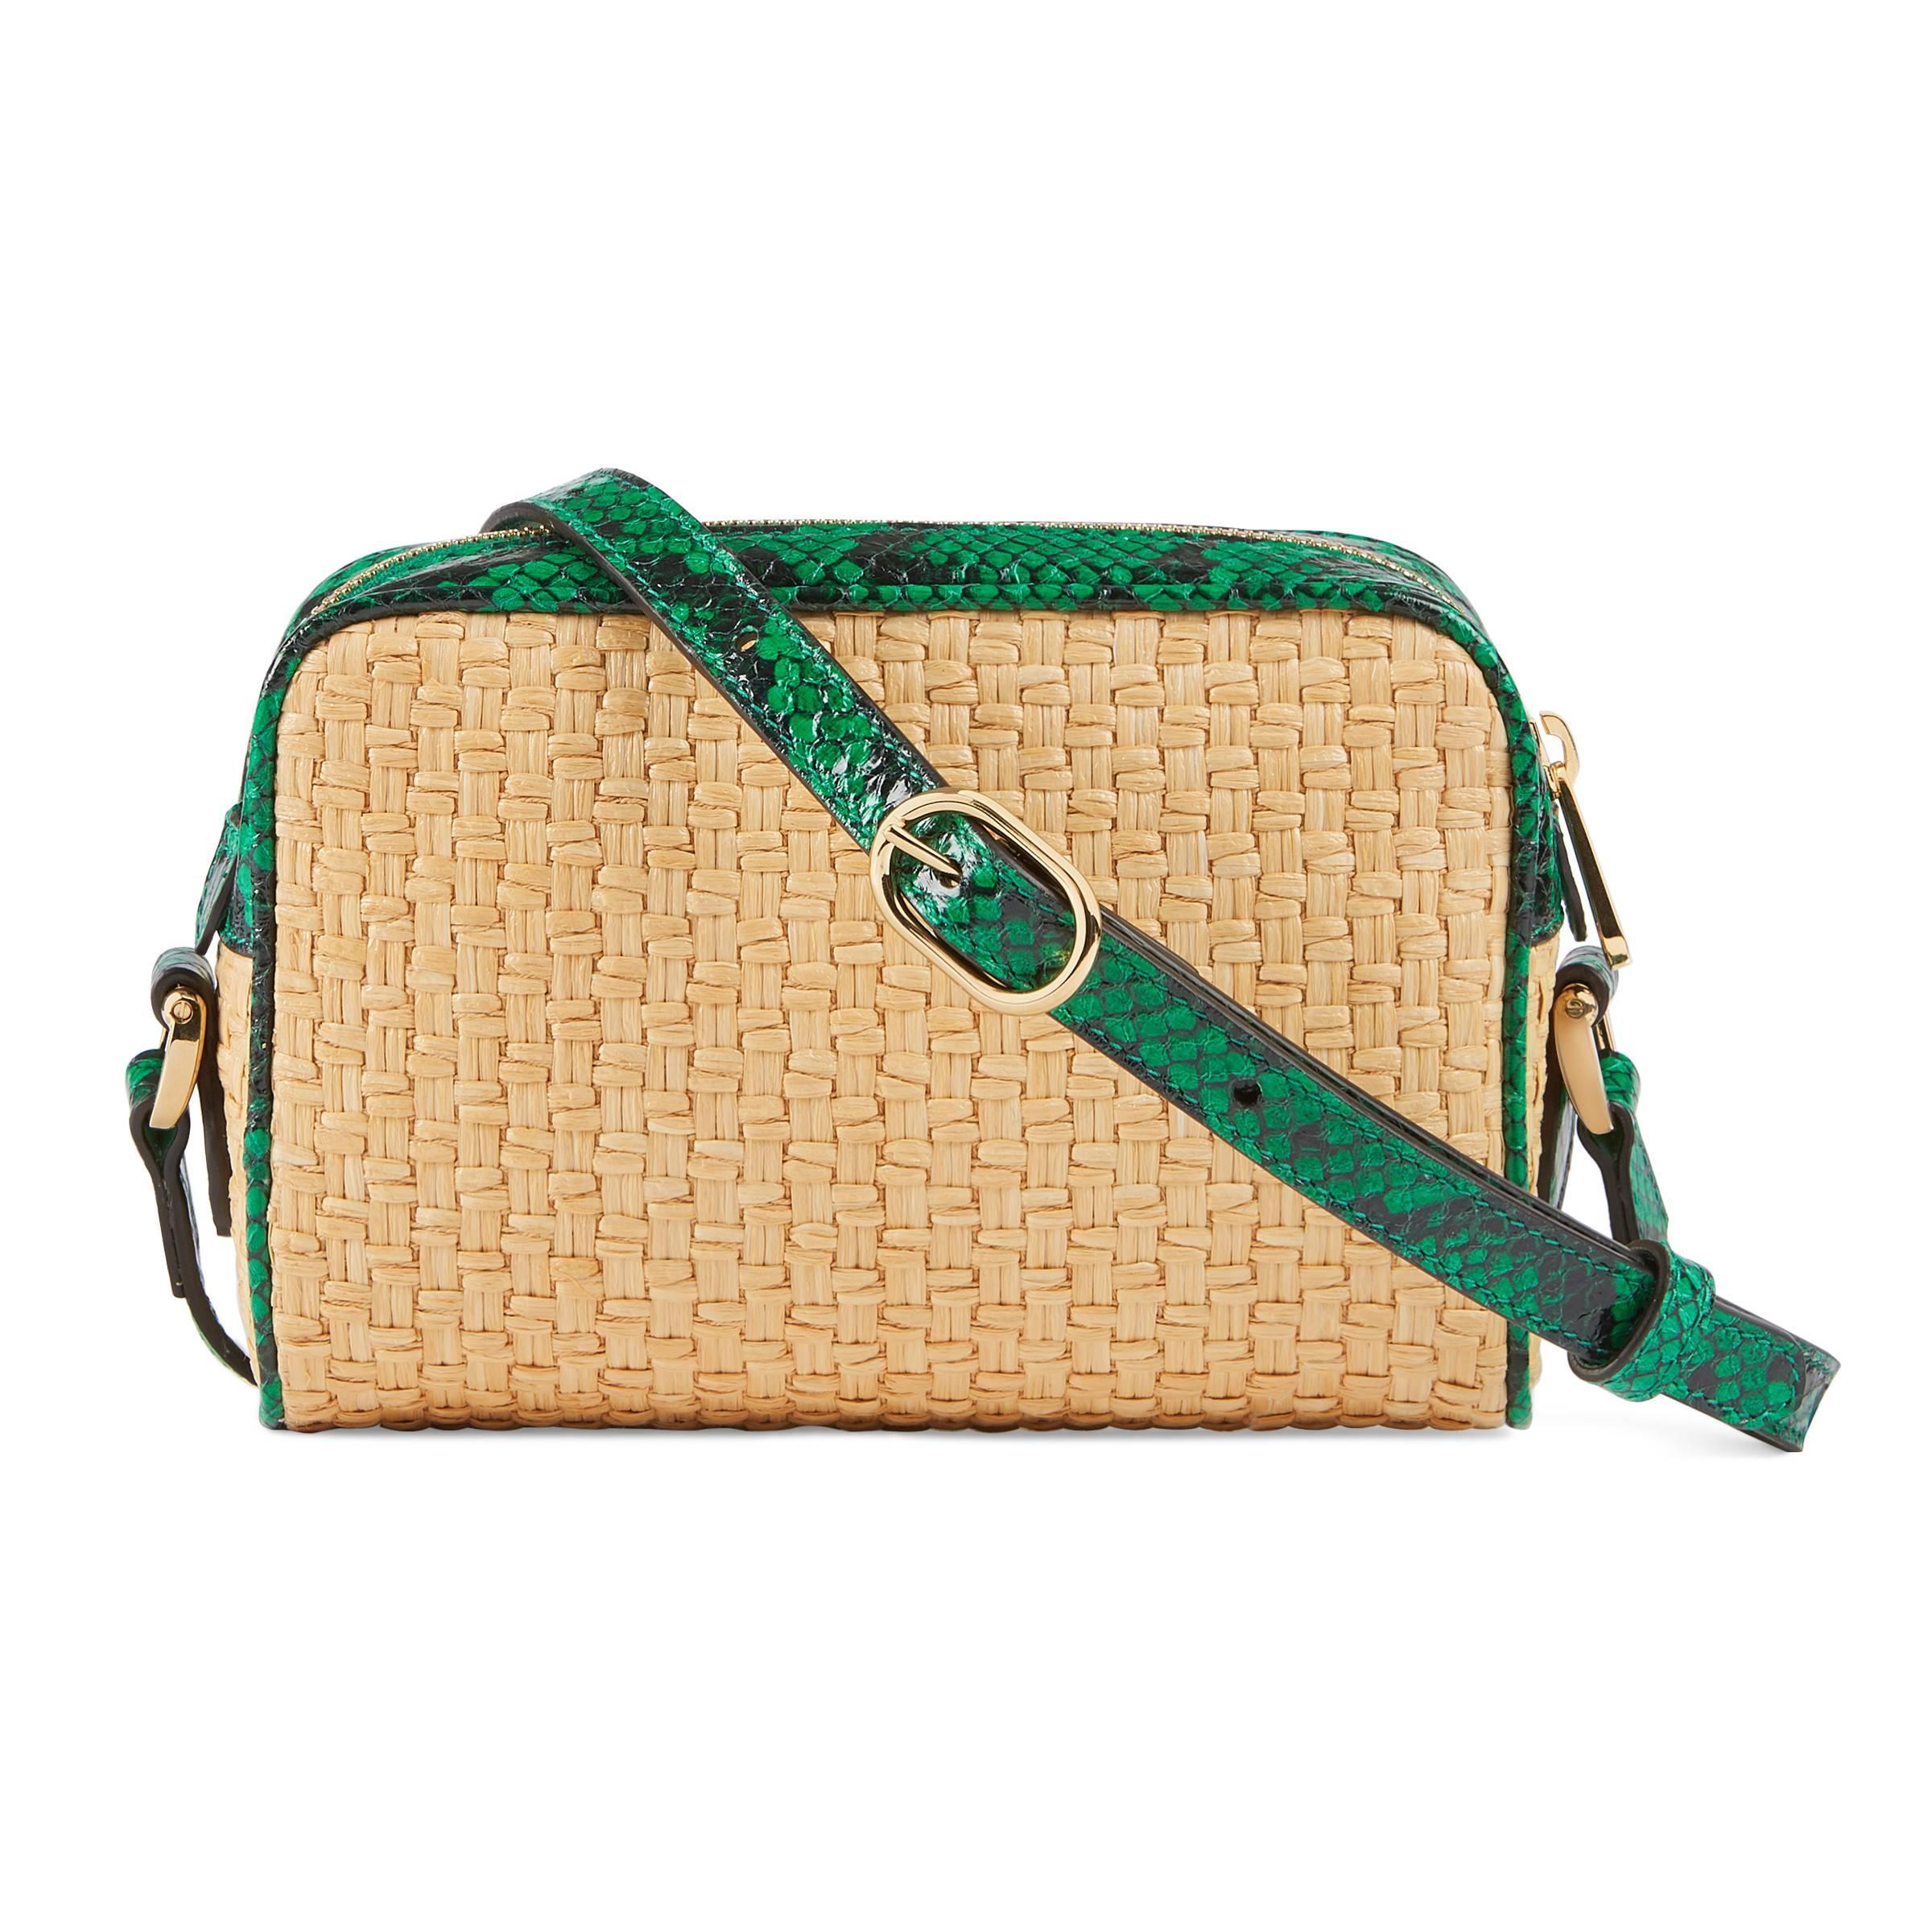 90f31d879c8d ... Online Exclusive Ophidia Mini Bag - Lyst. View fullscreen